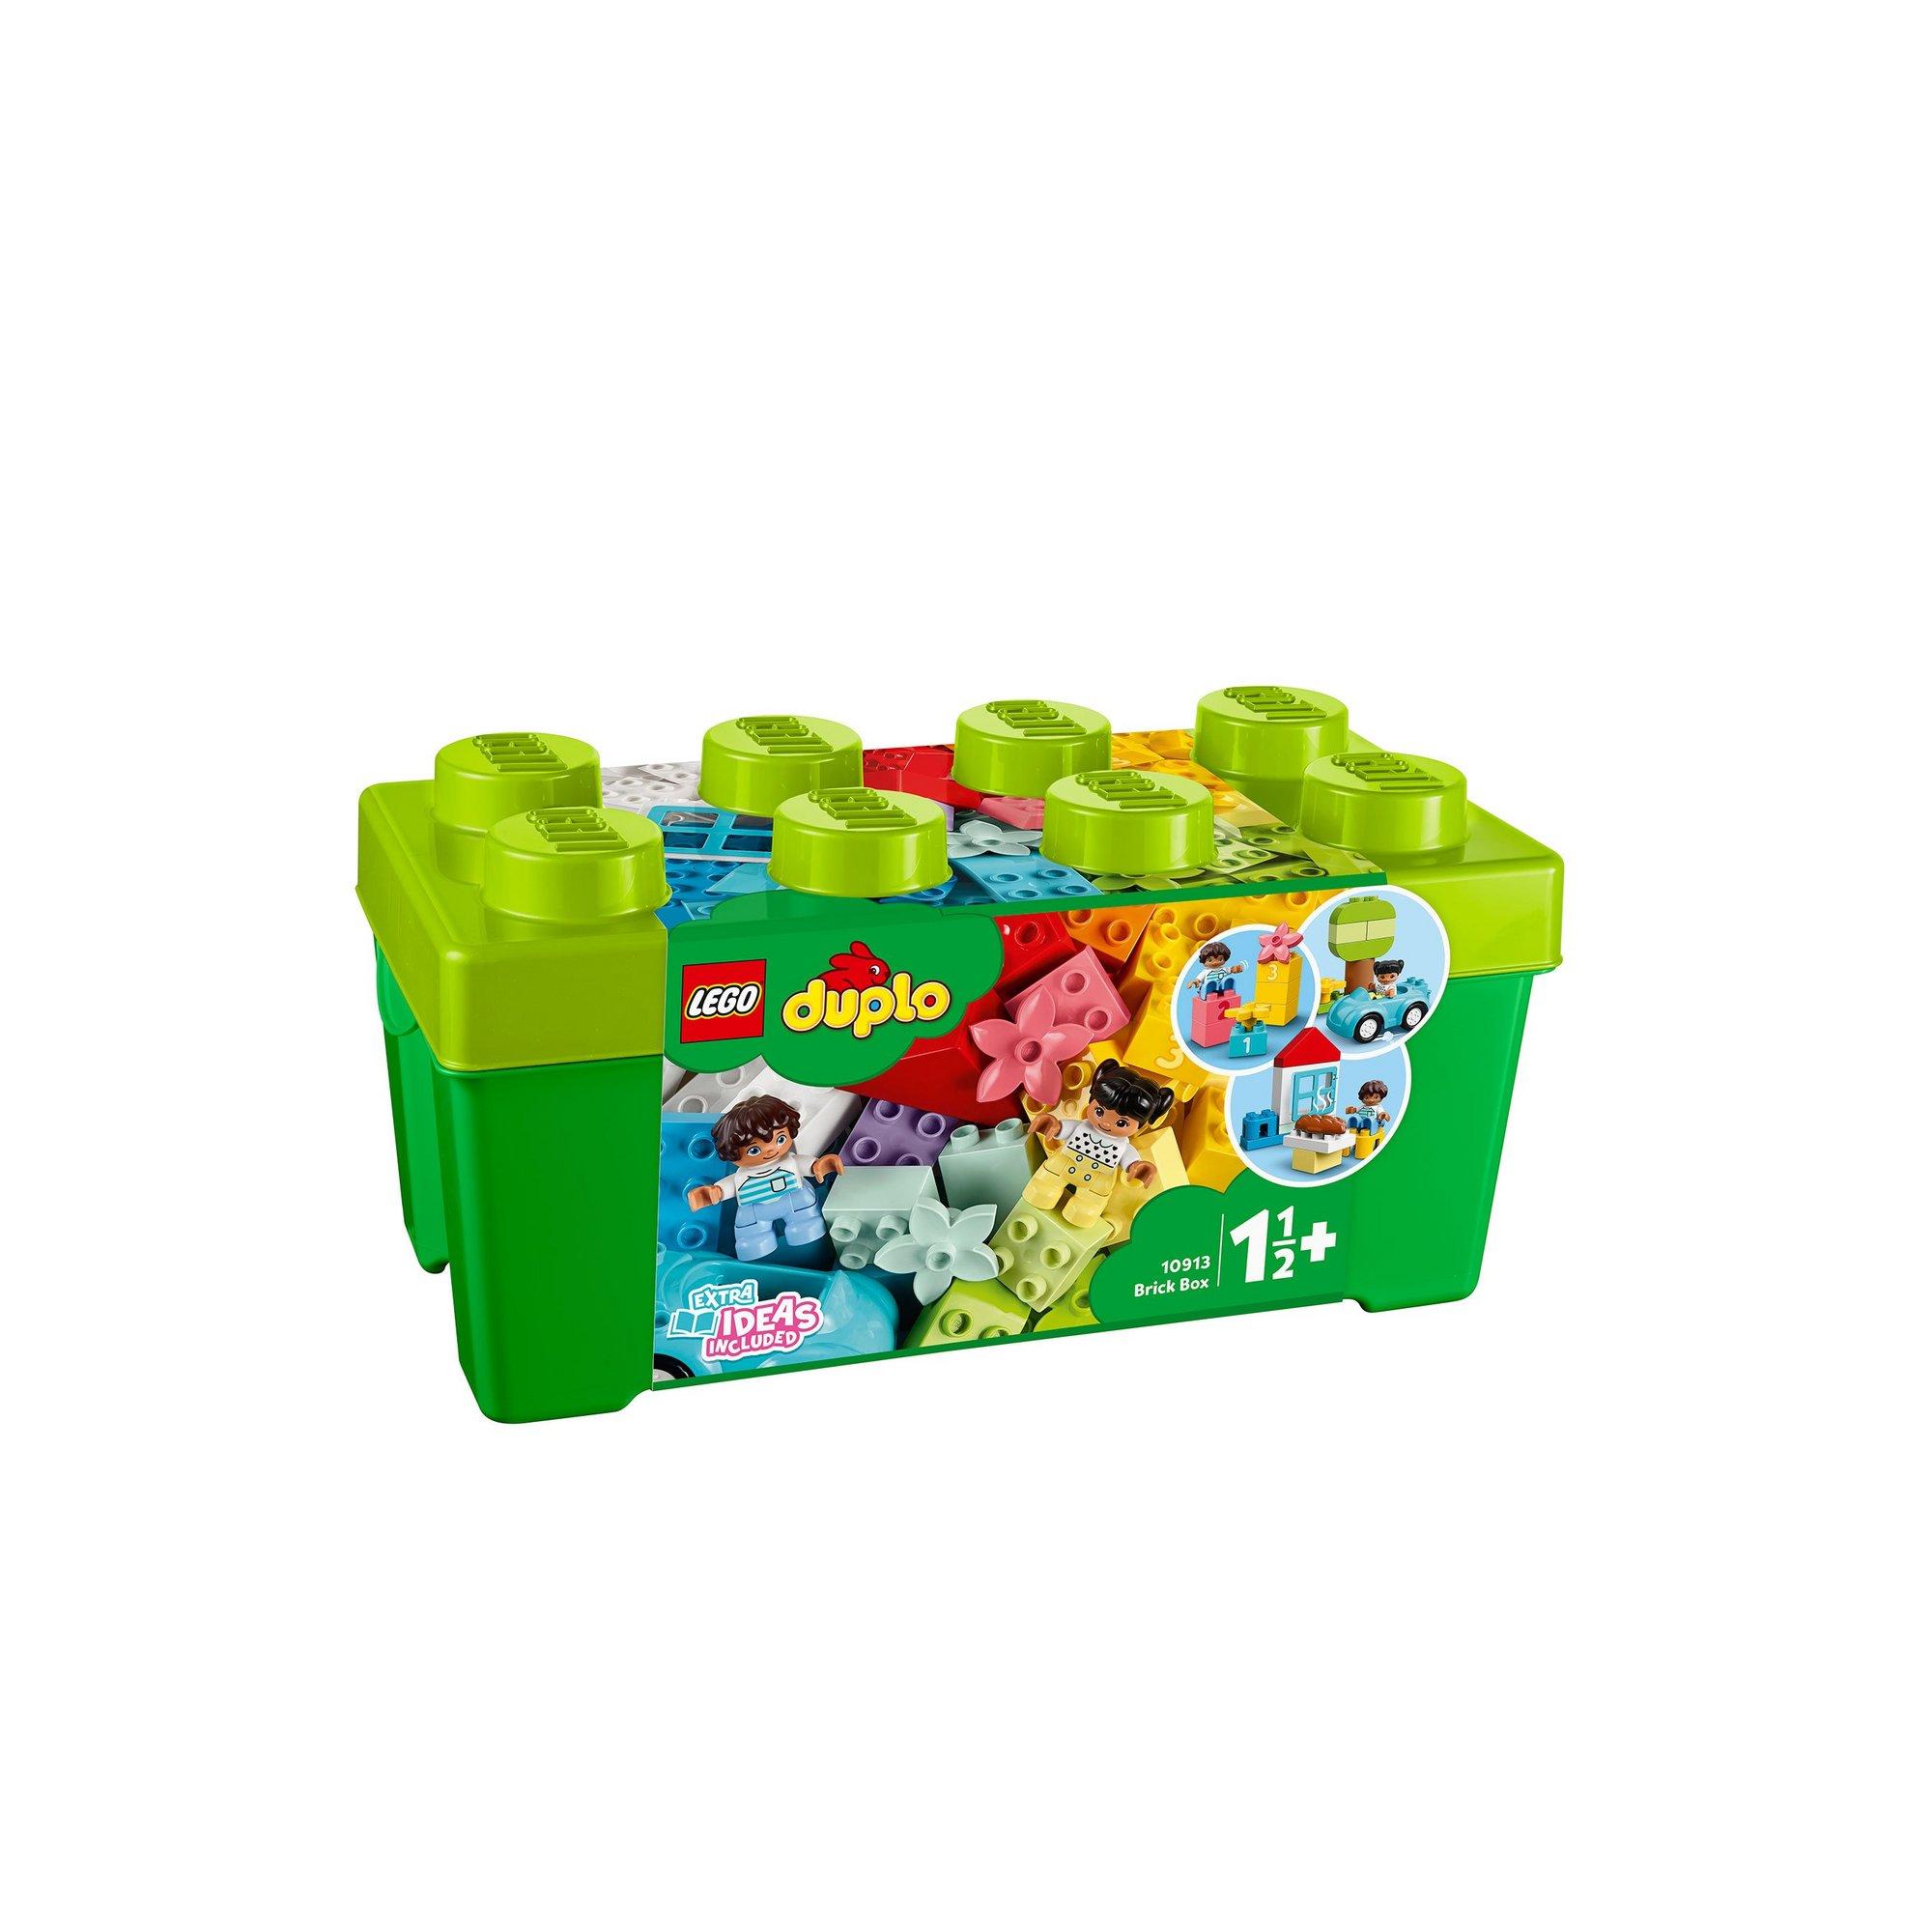 Image of LEGO DUPLO Classic Brick Box